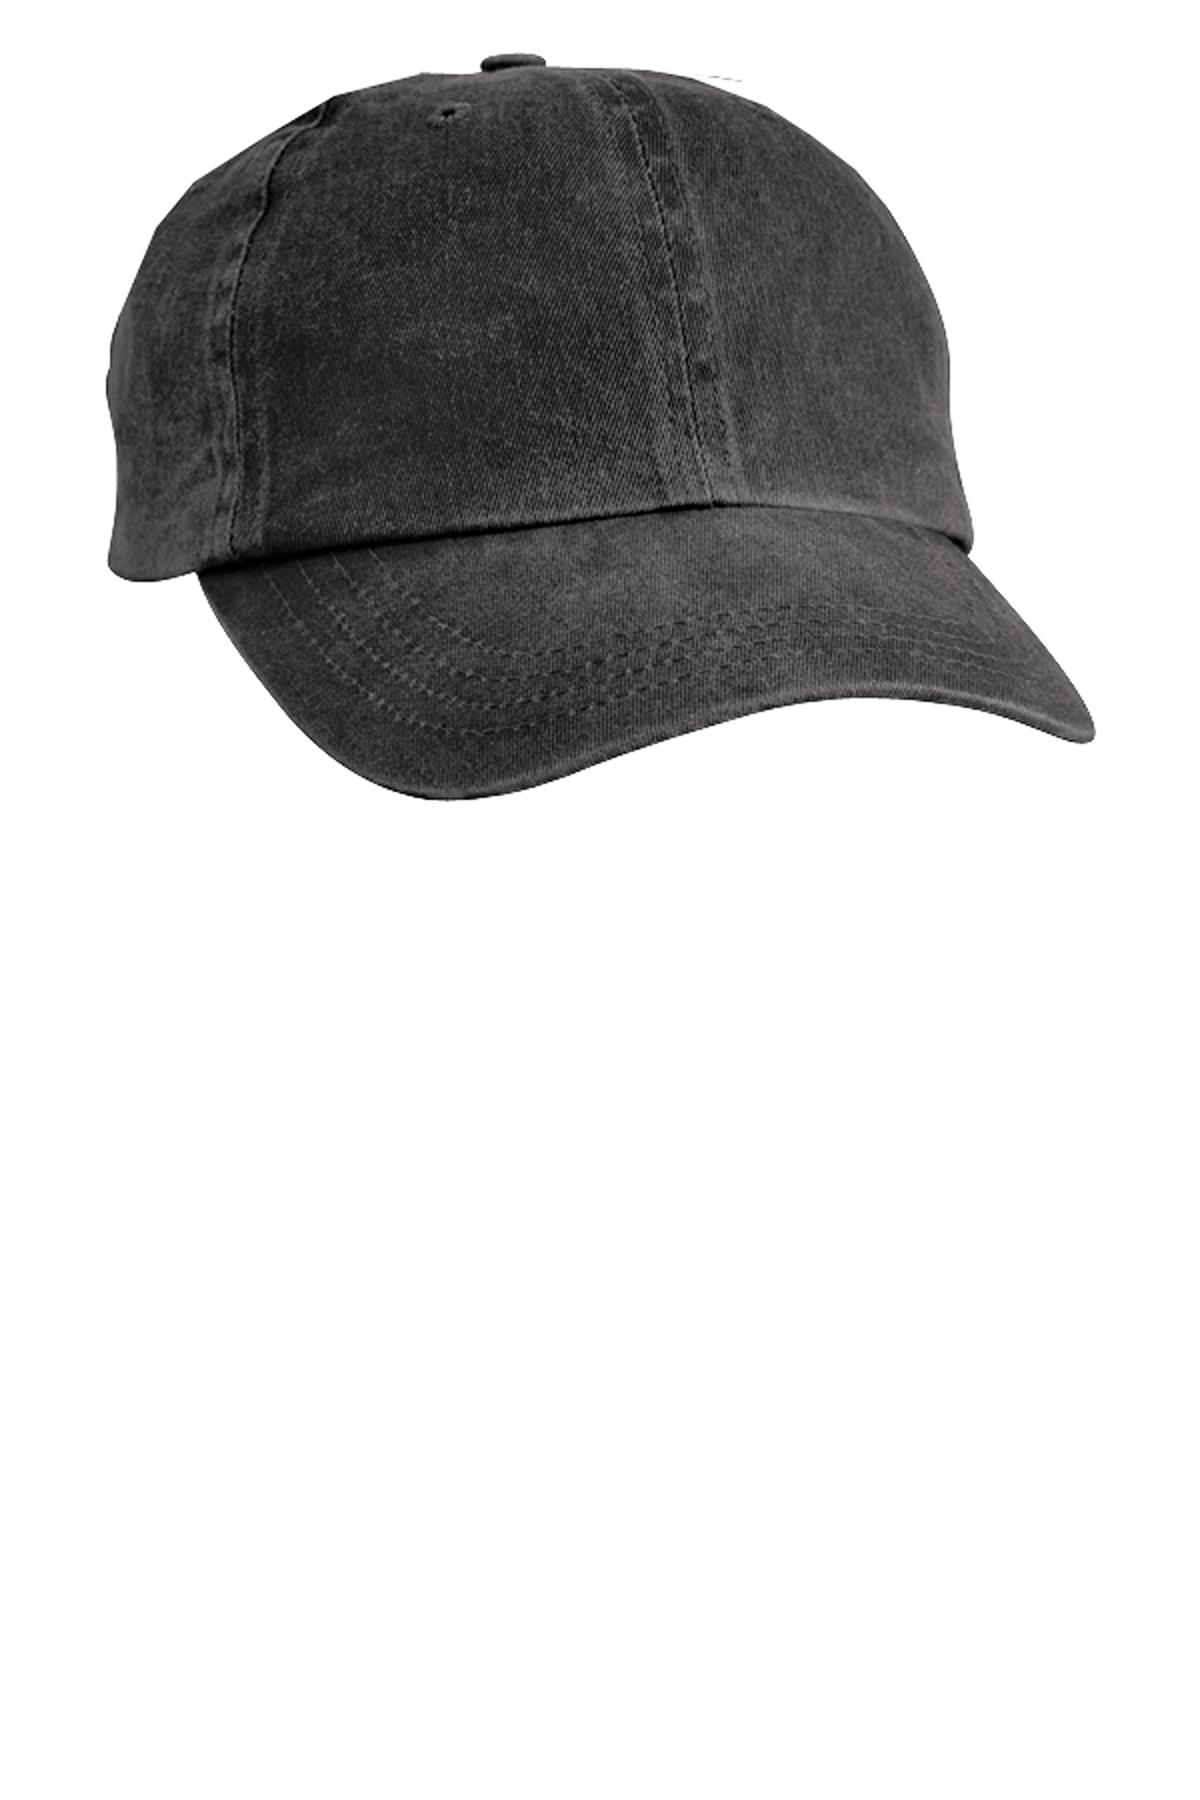 44f873ed559 Port   Company® - Pigment-Dyed Cap